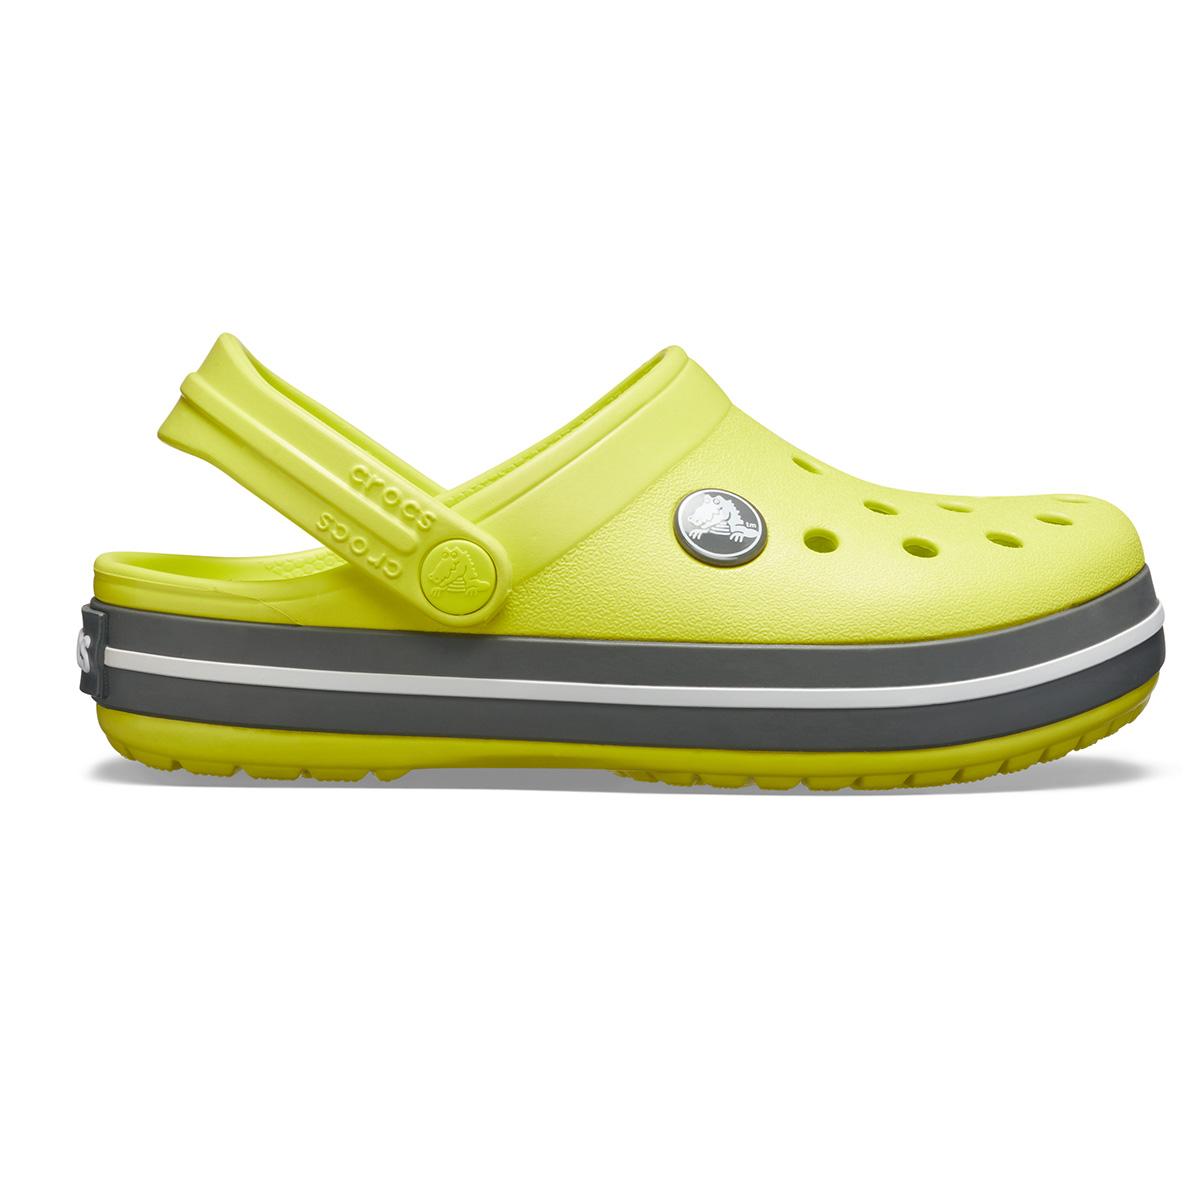 Crocs Crocband Clog K - Turunçgil/Barut rengi